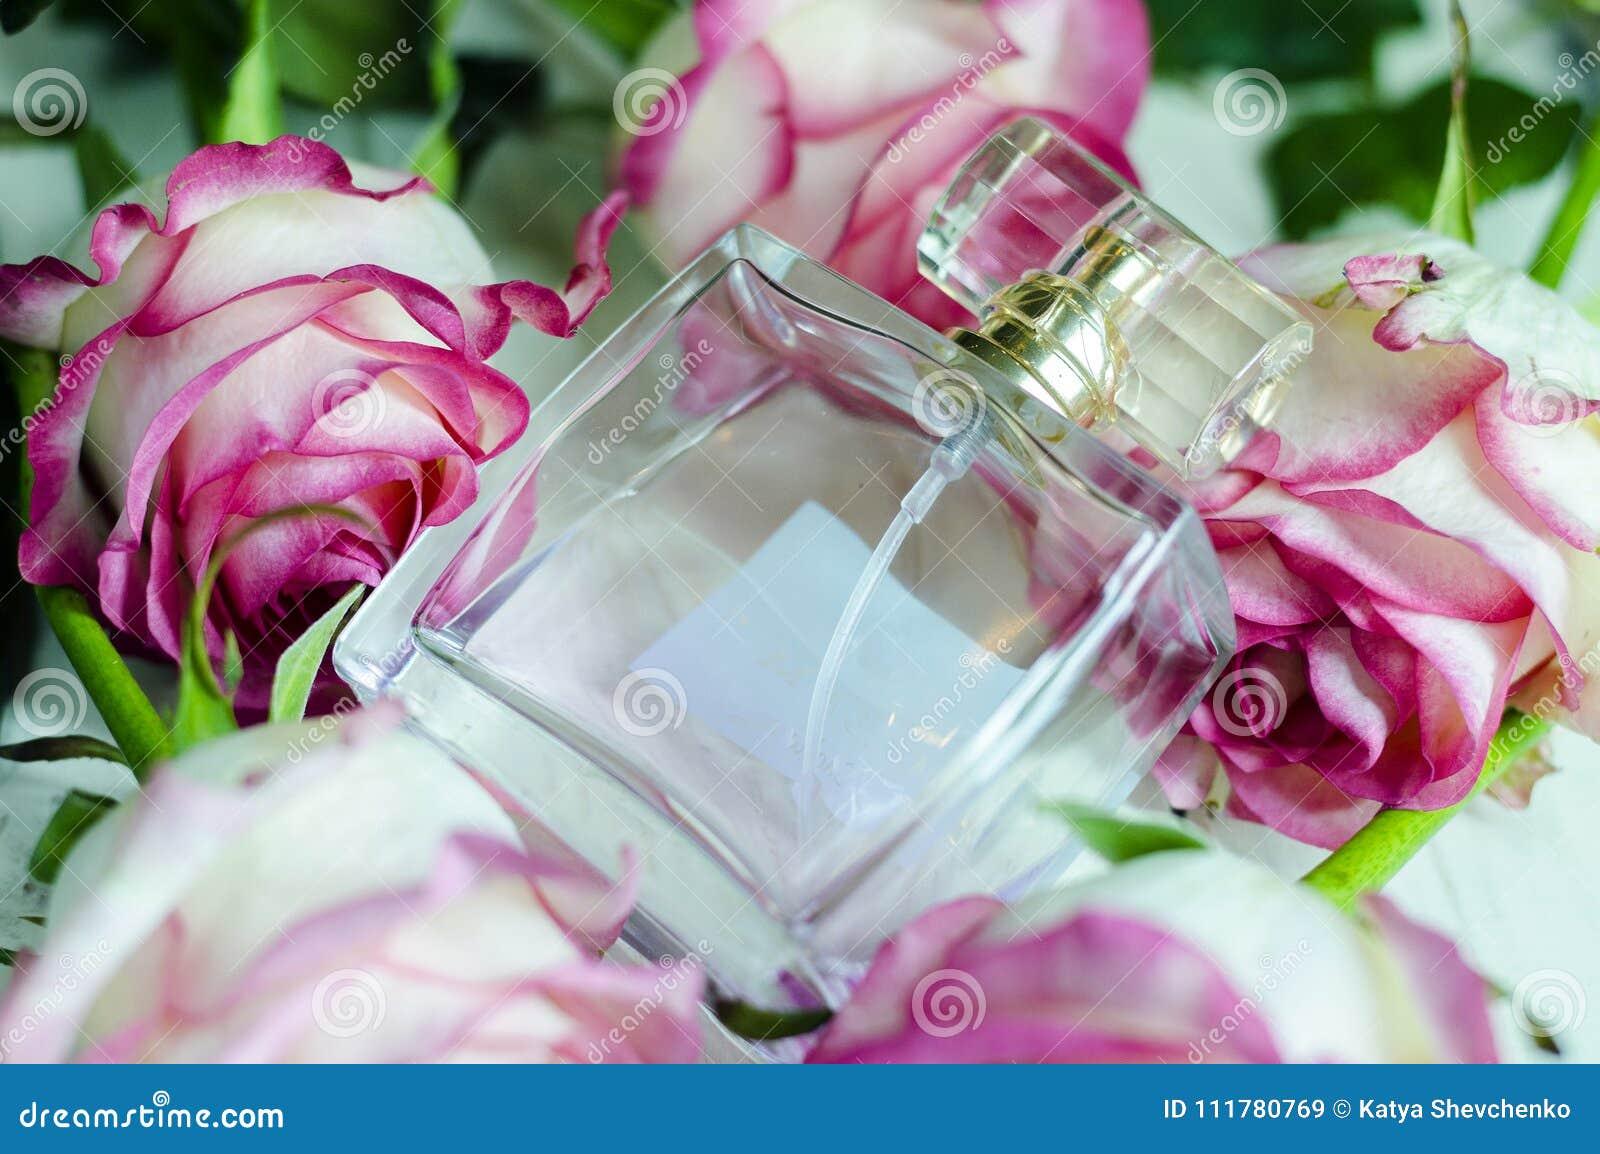 Floral female perfume